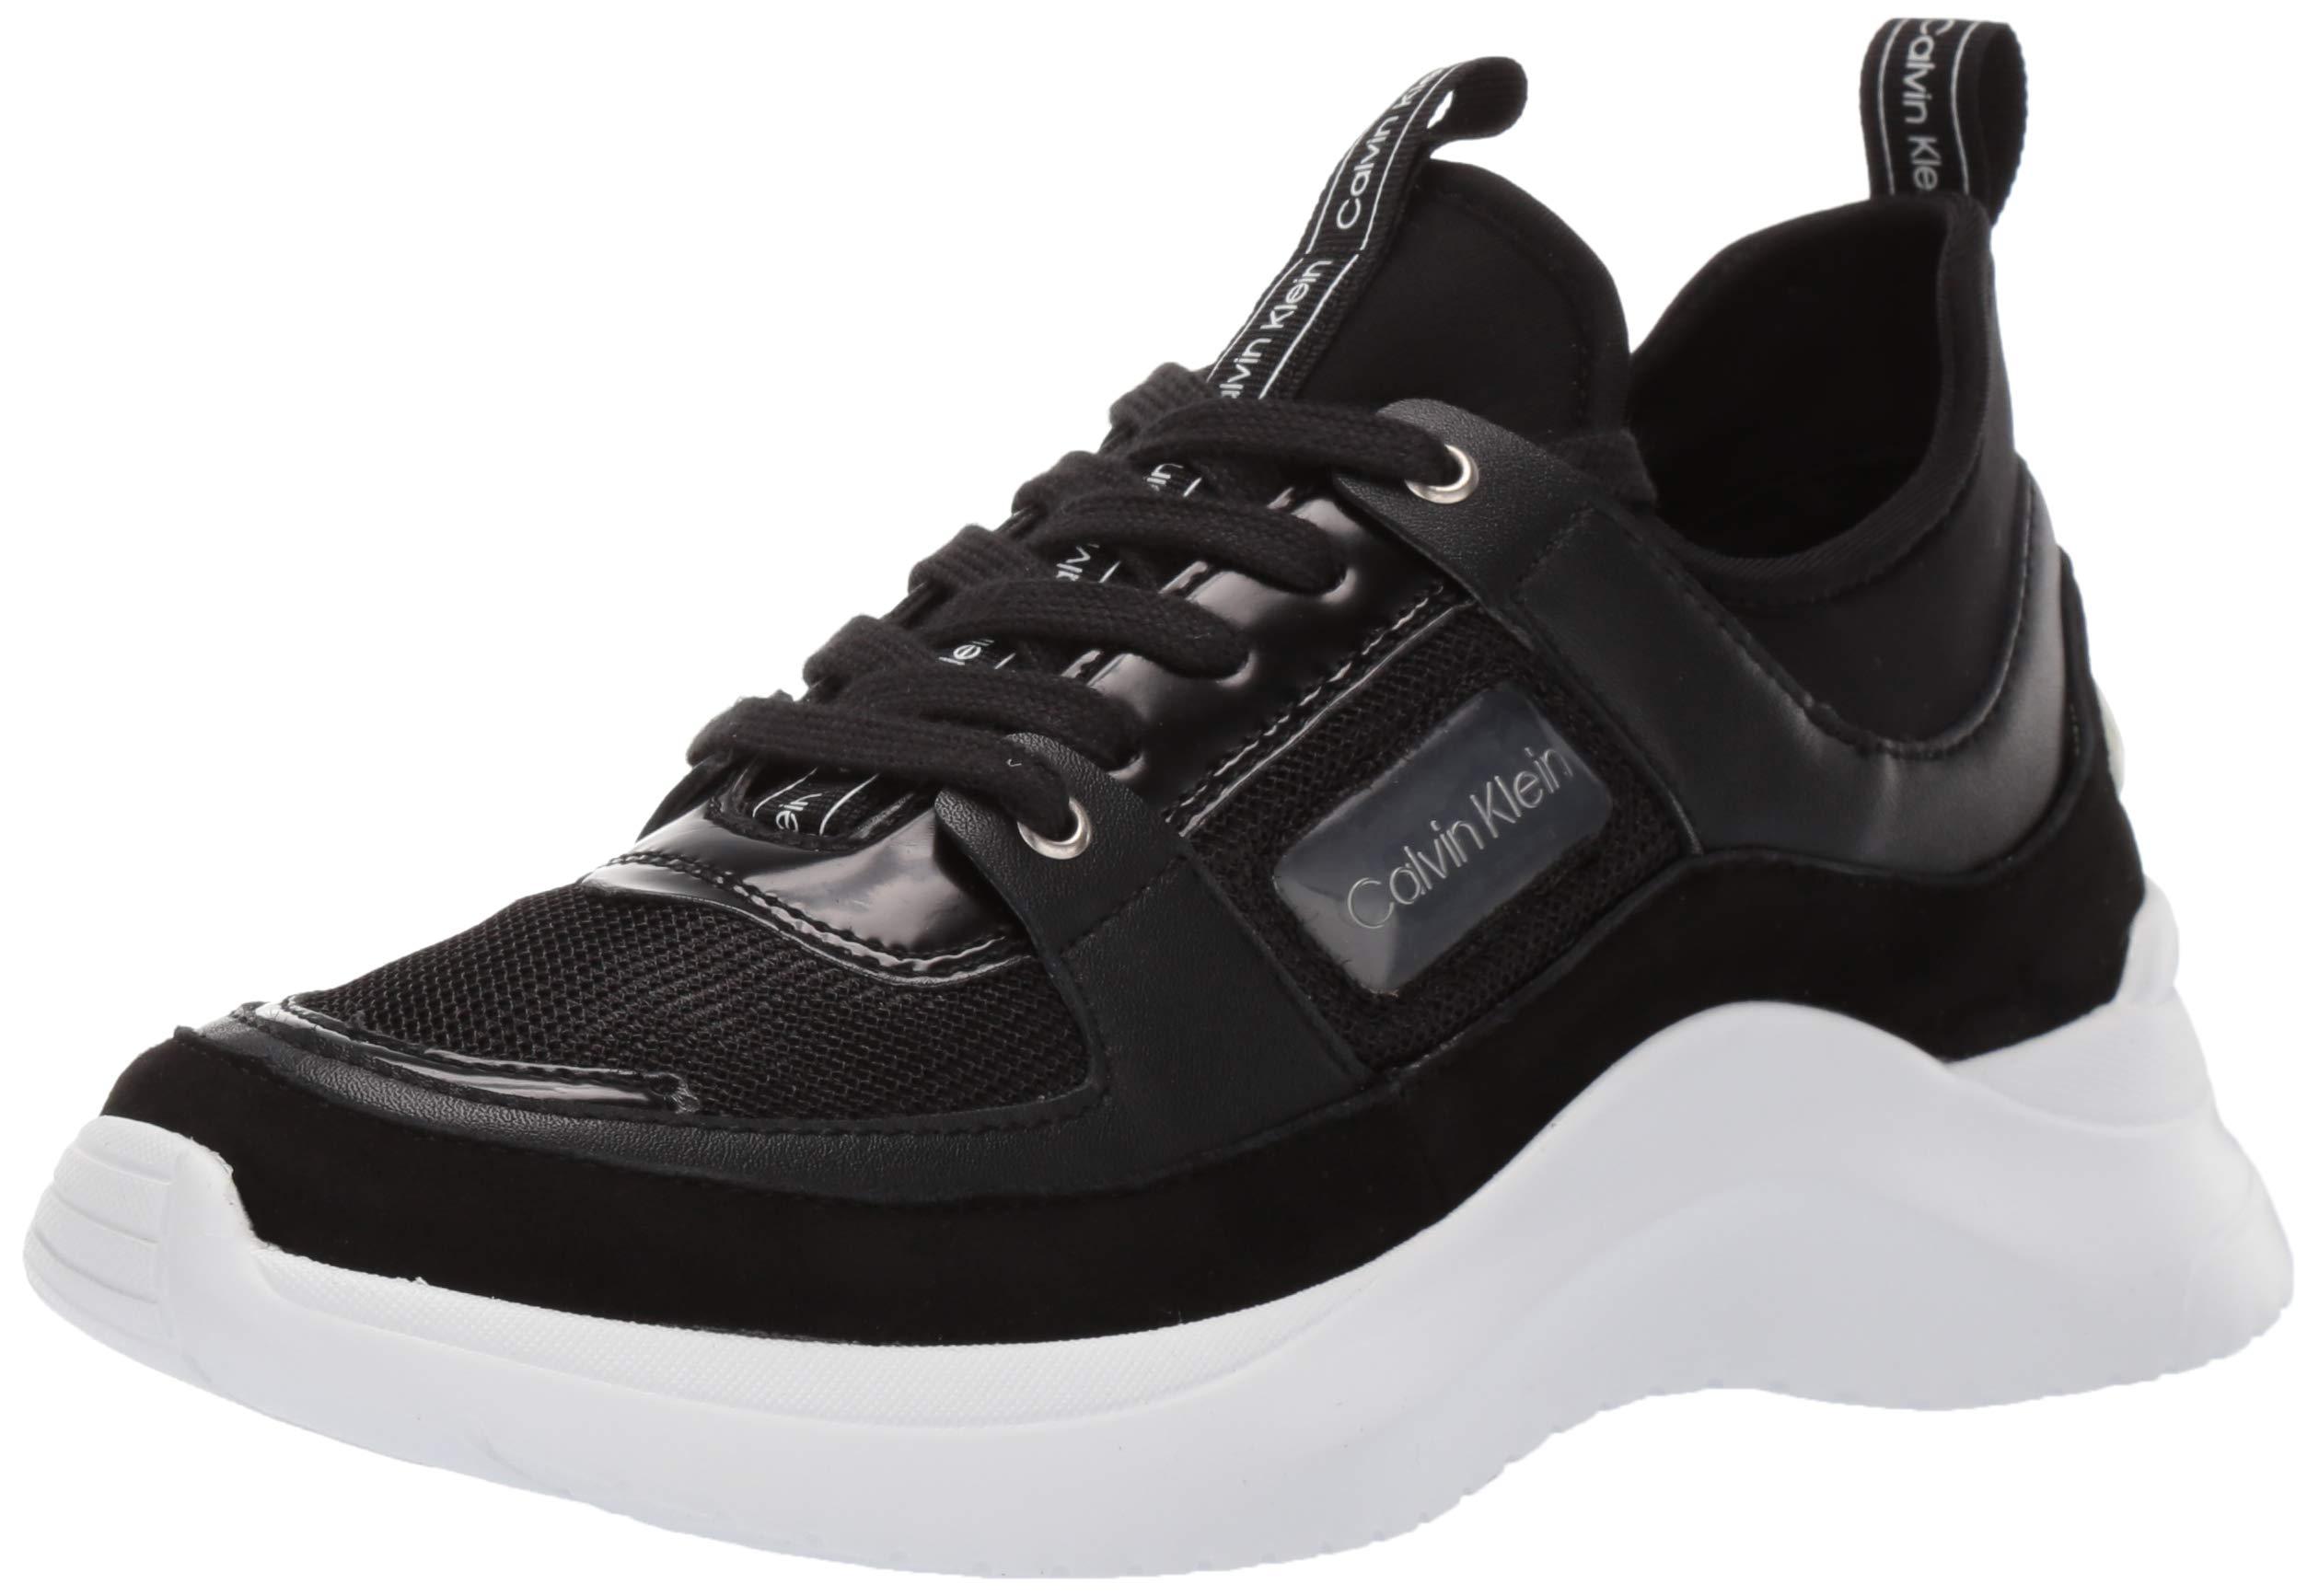 calvin klein shoes canada online